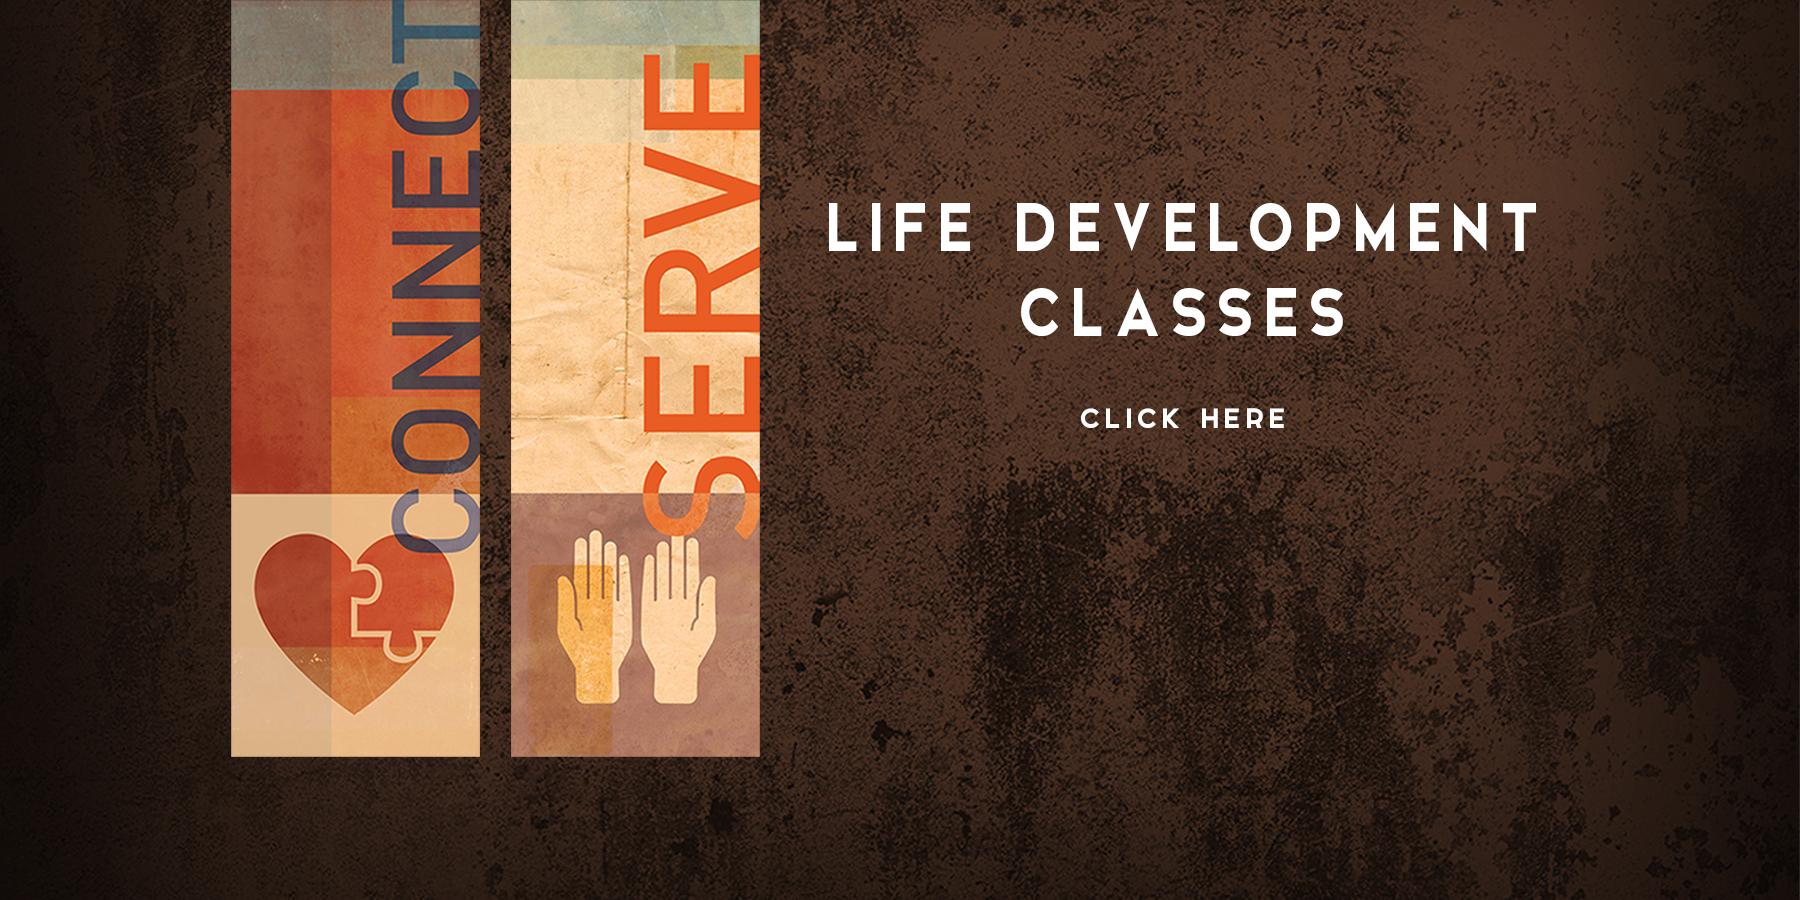 web-slider-2-classes